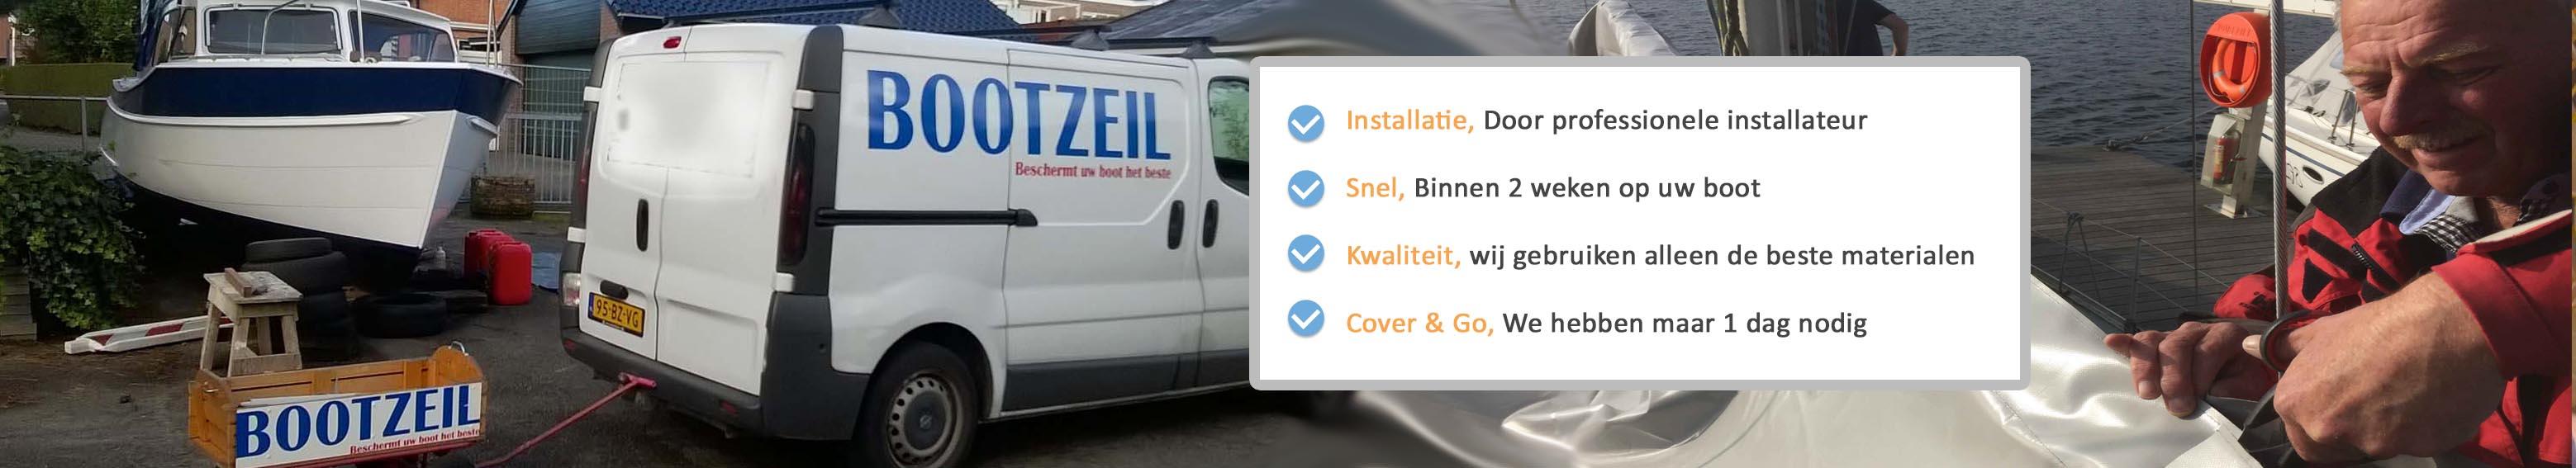 Bootzeil service